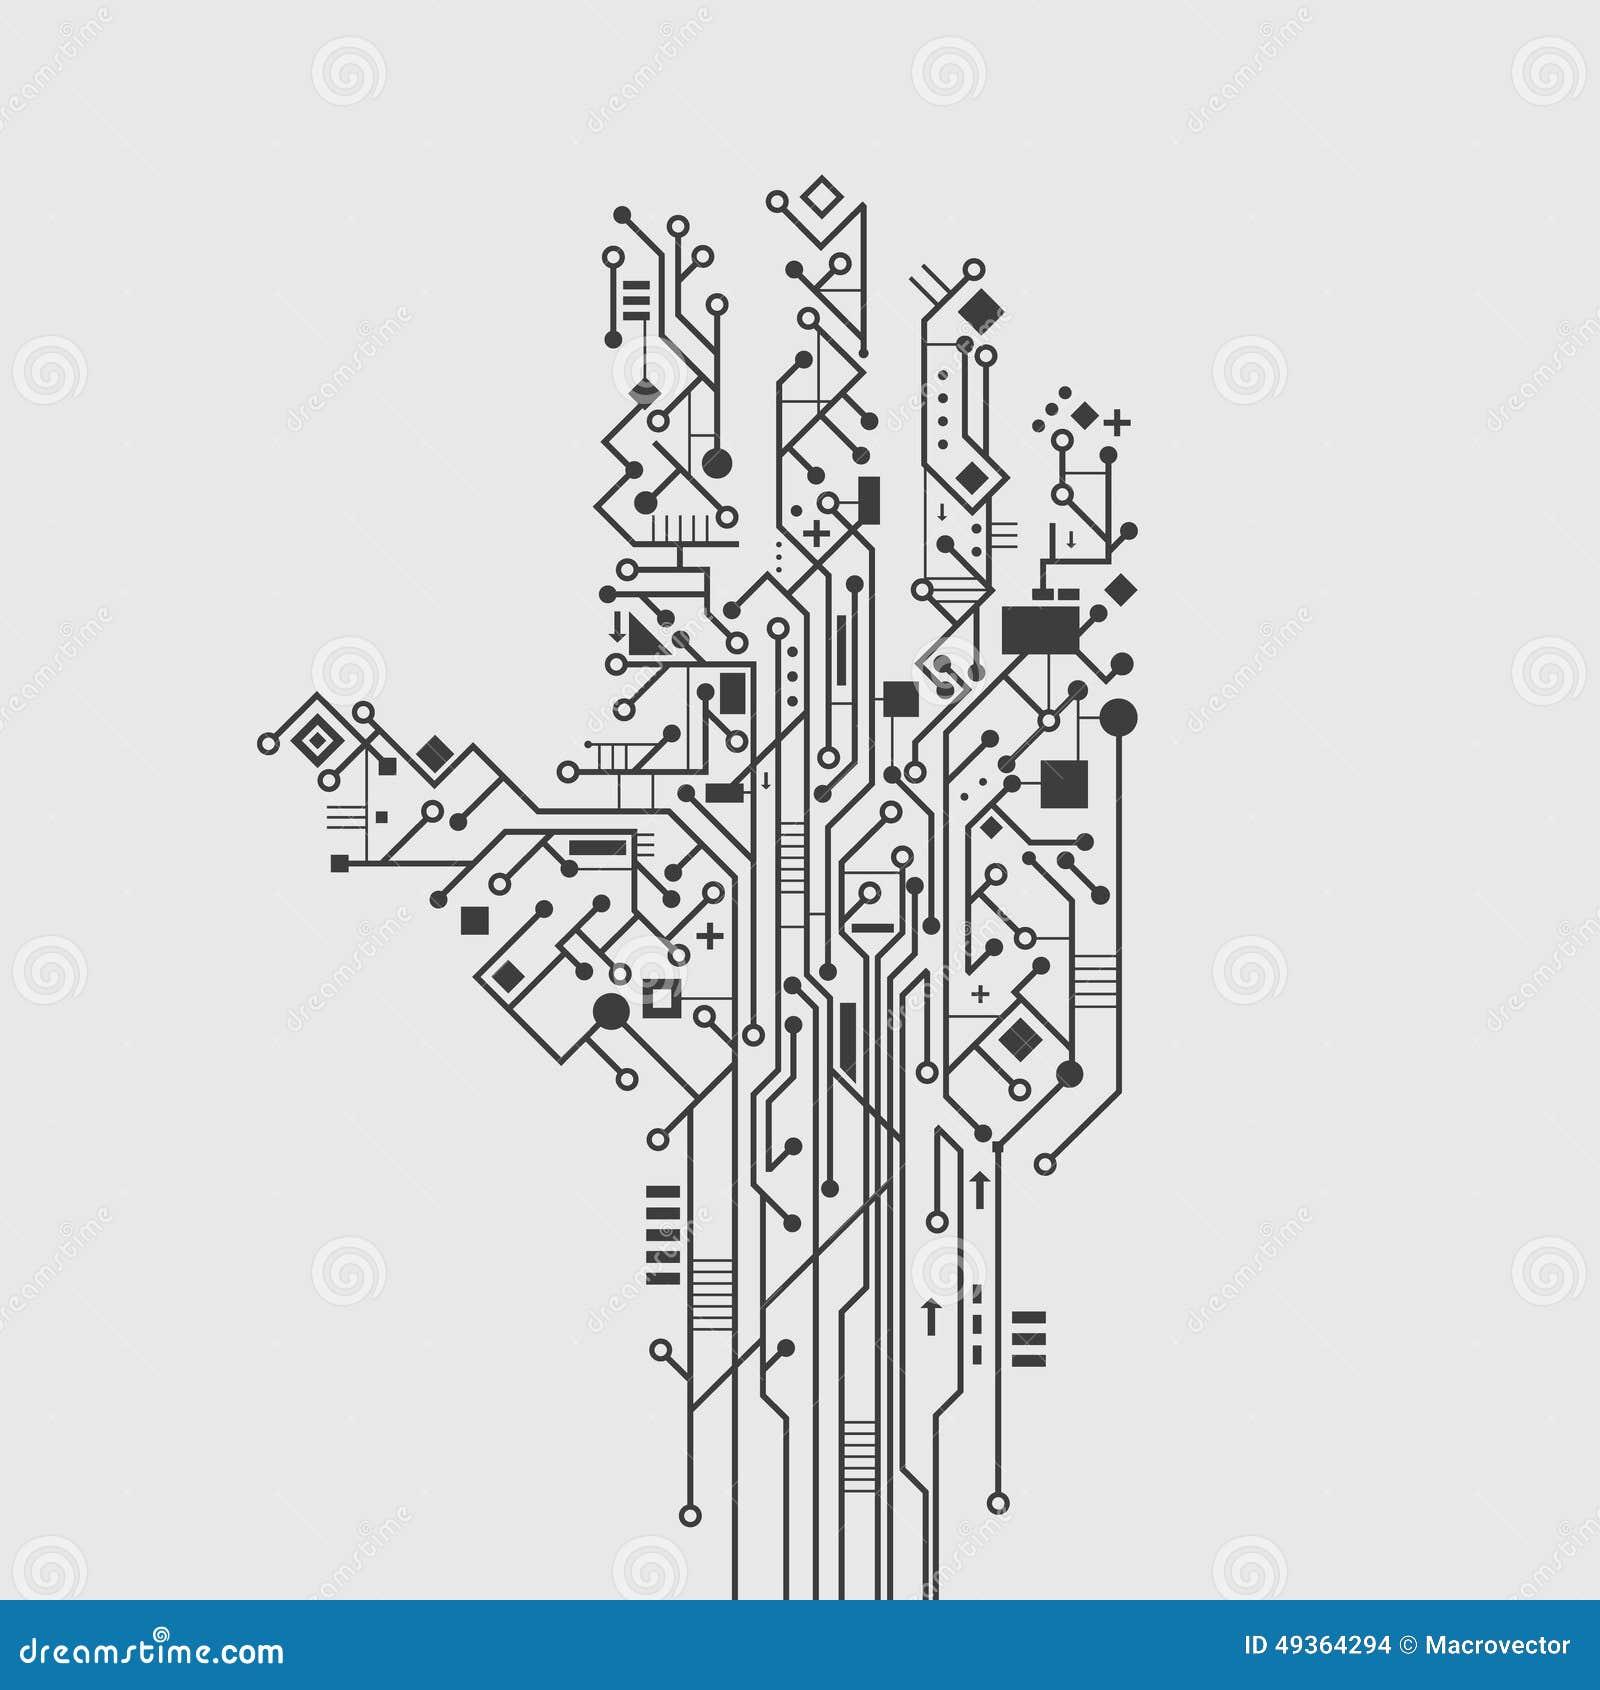 circuit board hand